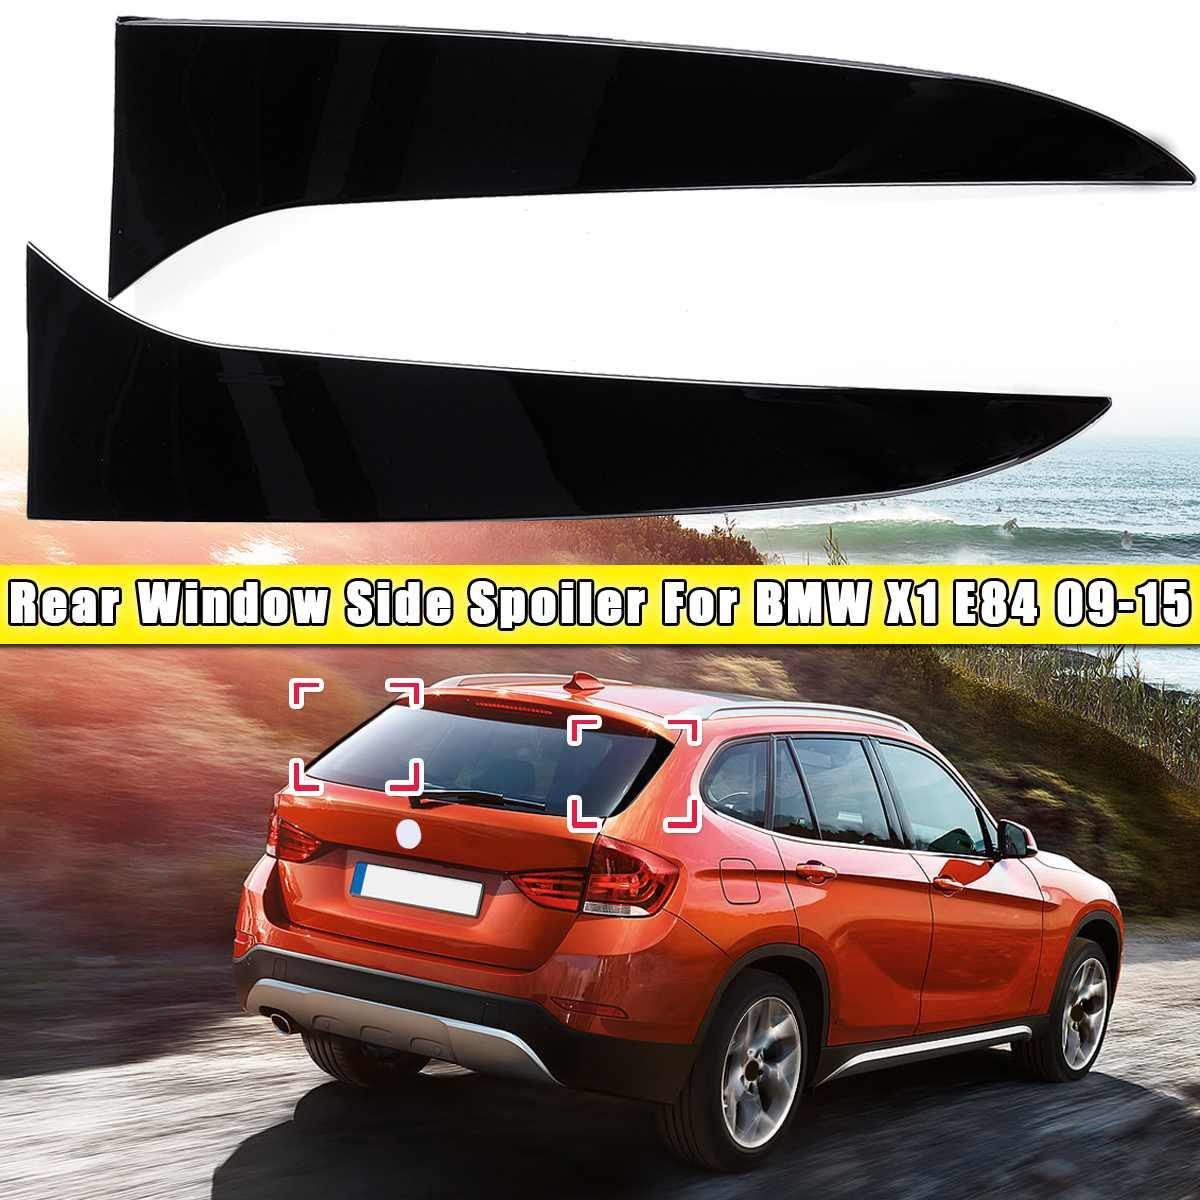 1 Pair gloss black Rear Window Side Spoiler Air Splitter For BMW X1 E84 2009 2010 2011 2012 2013 2014 2015 Spoilers Car styling